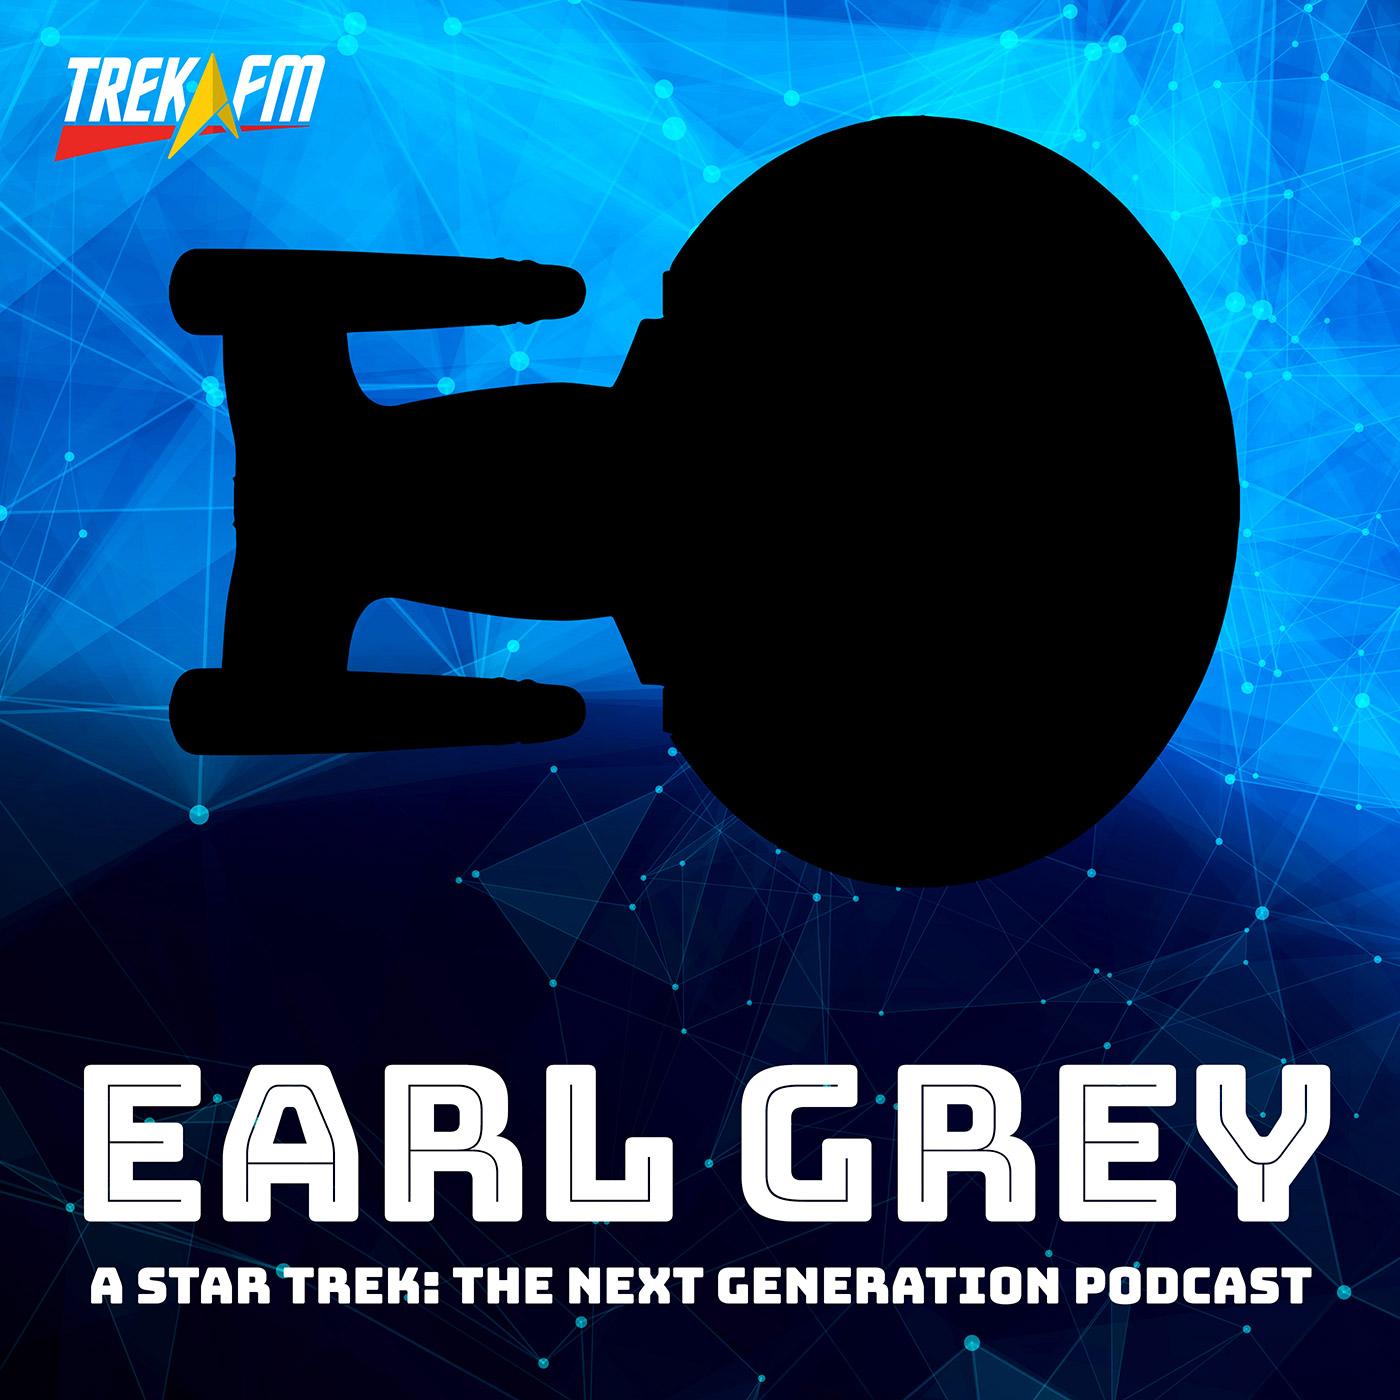 Earl Grey: A Star Trek The Next Generation Podcast